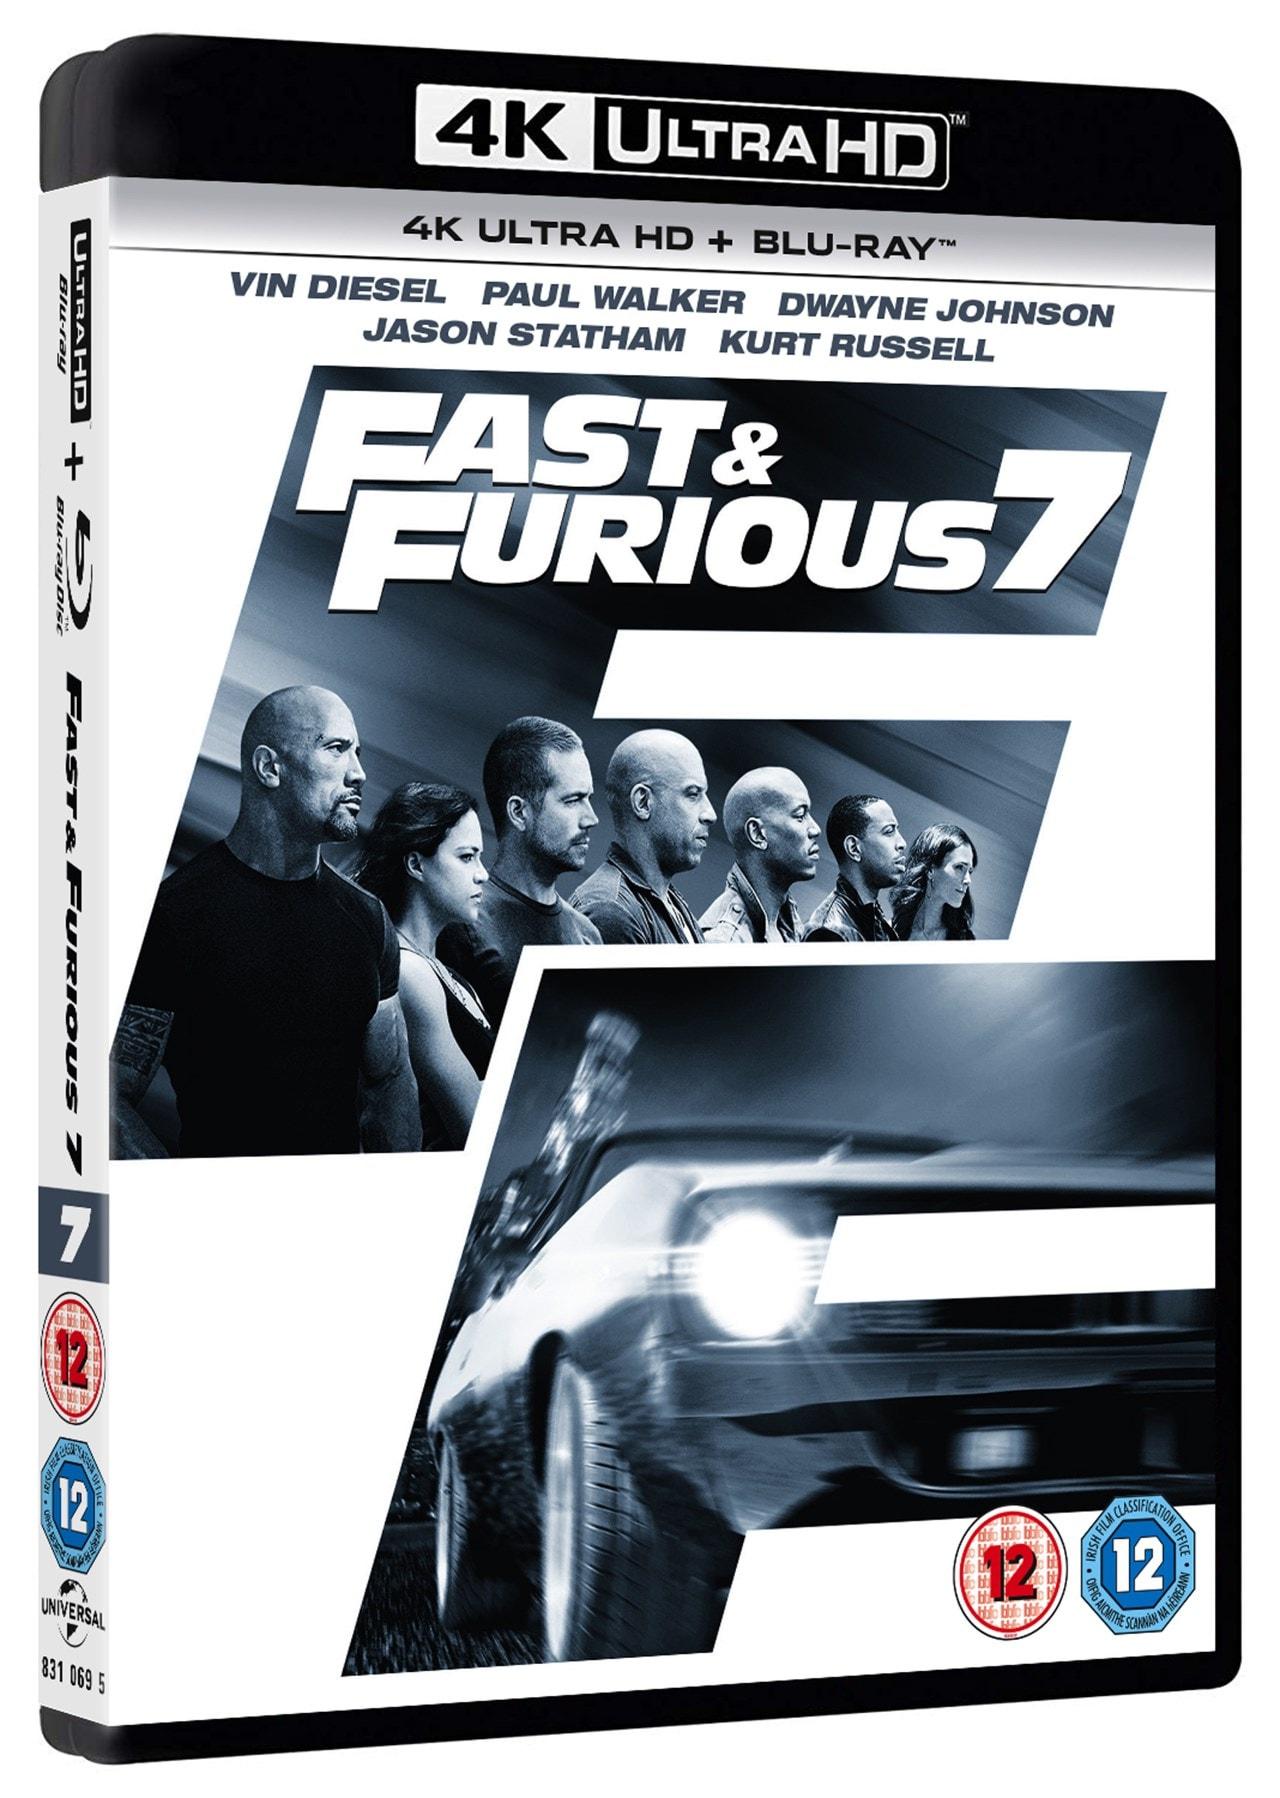 Fast & Furious 7 - 2